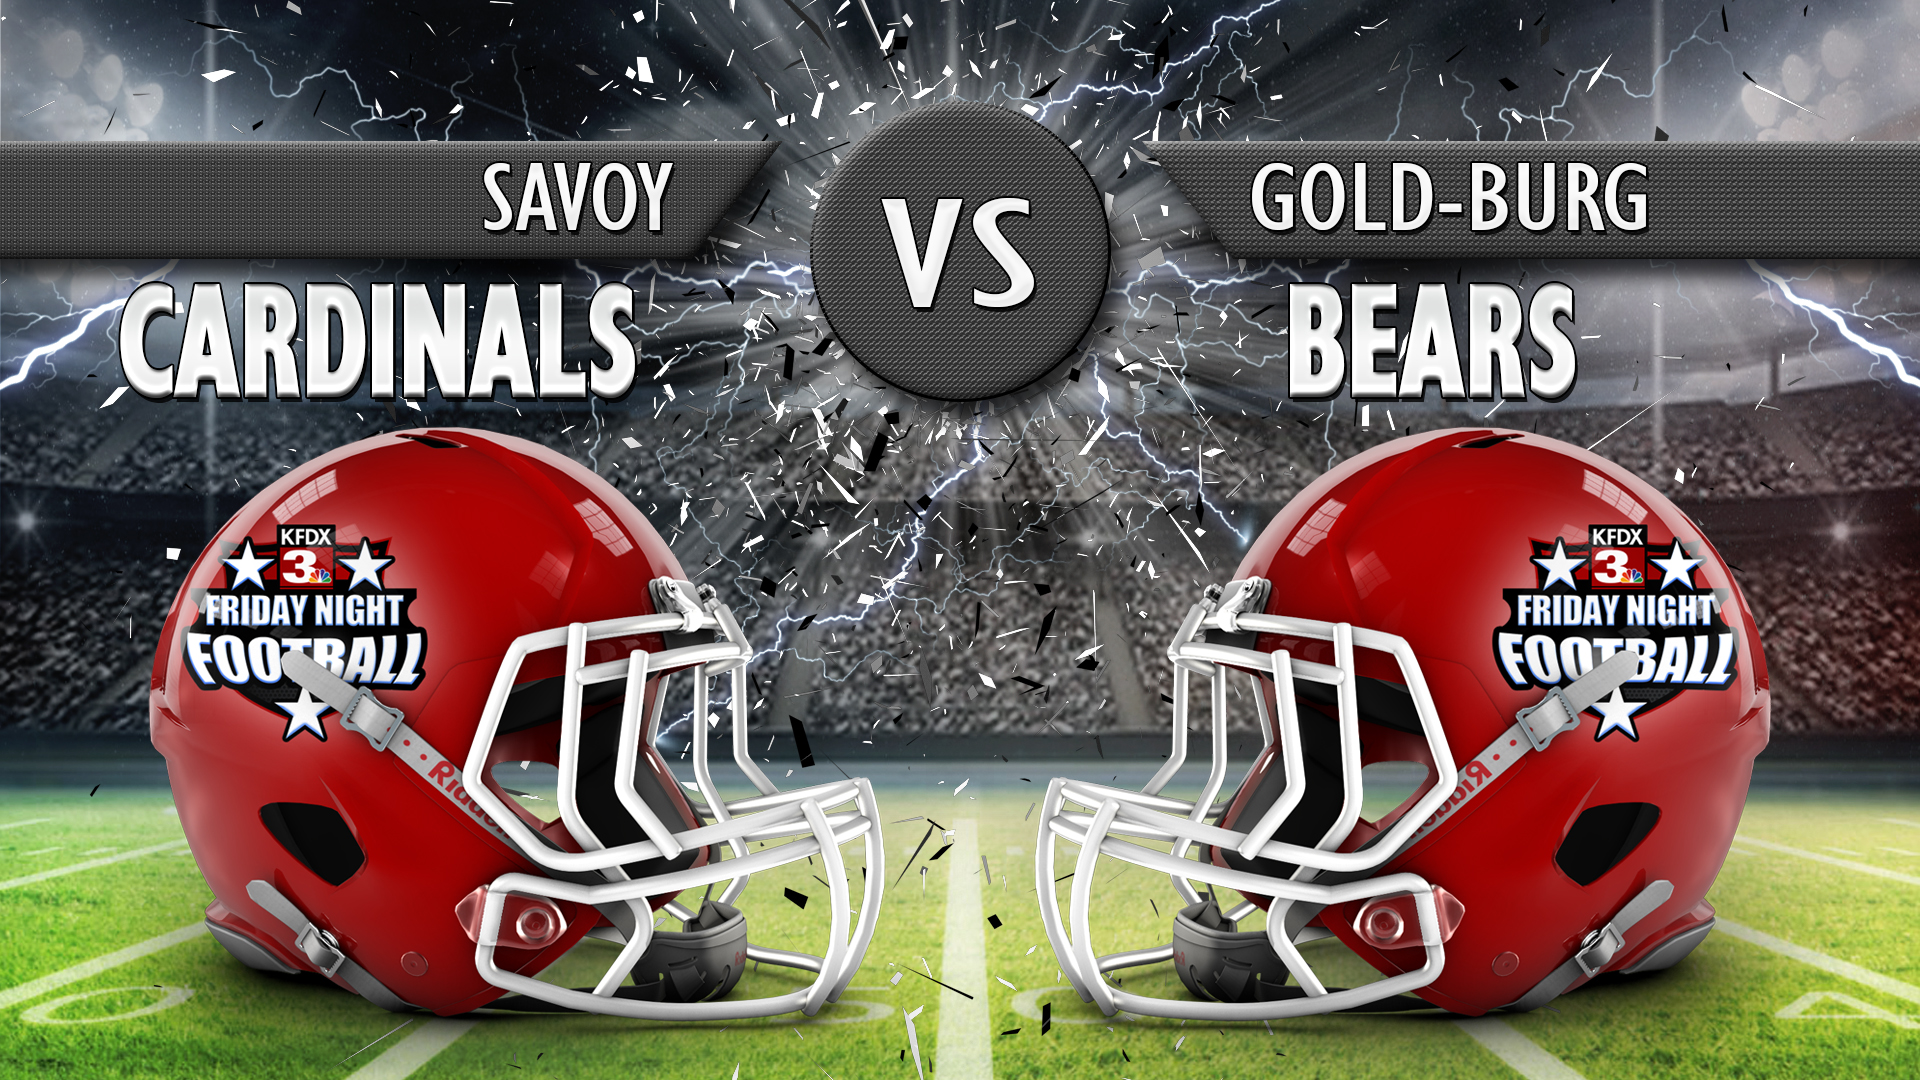 SAVOY VS GOLD-BURG_1536960767125.jpg.jpg